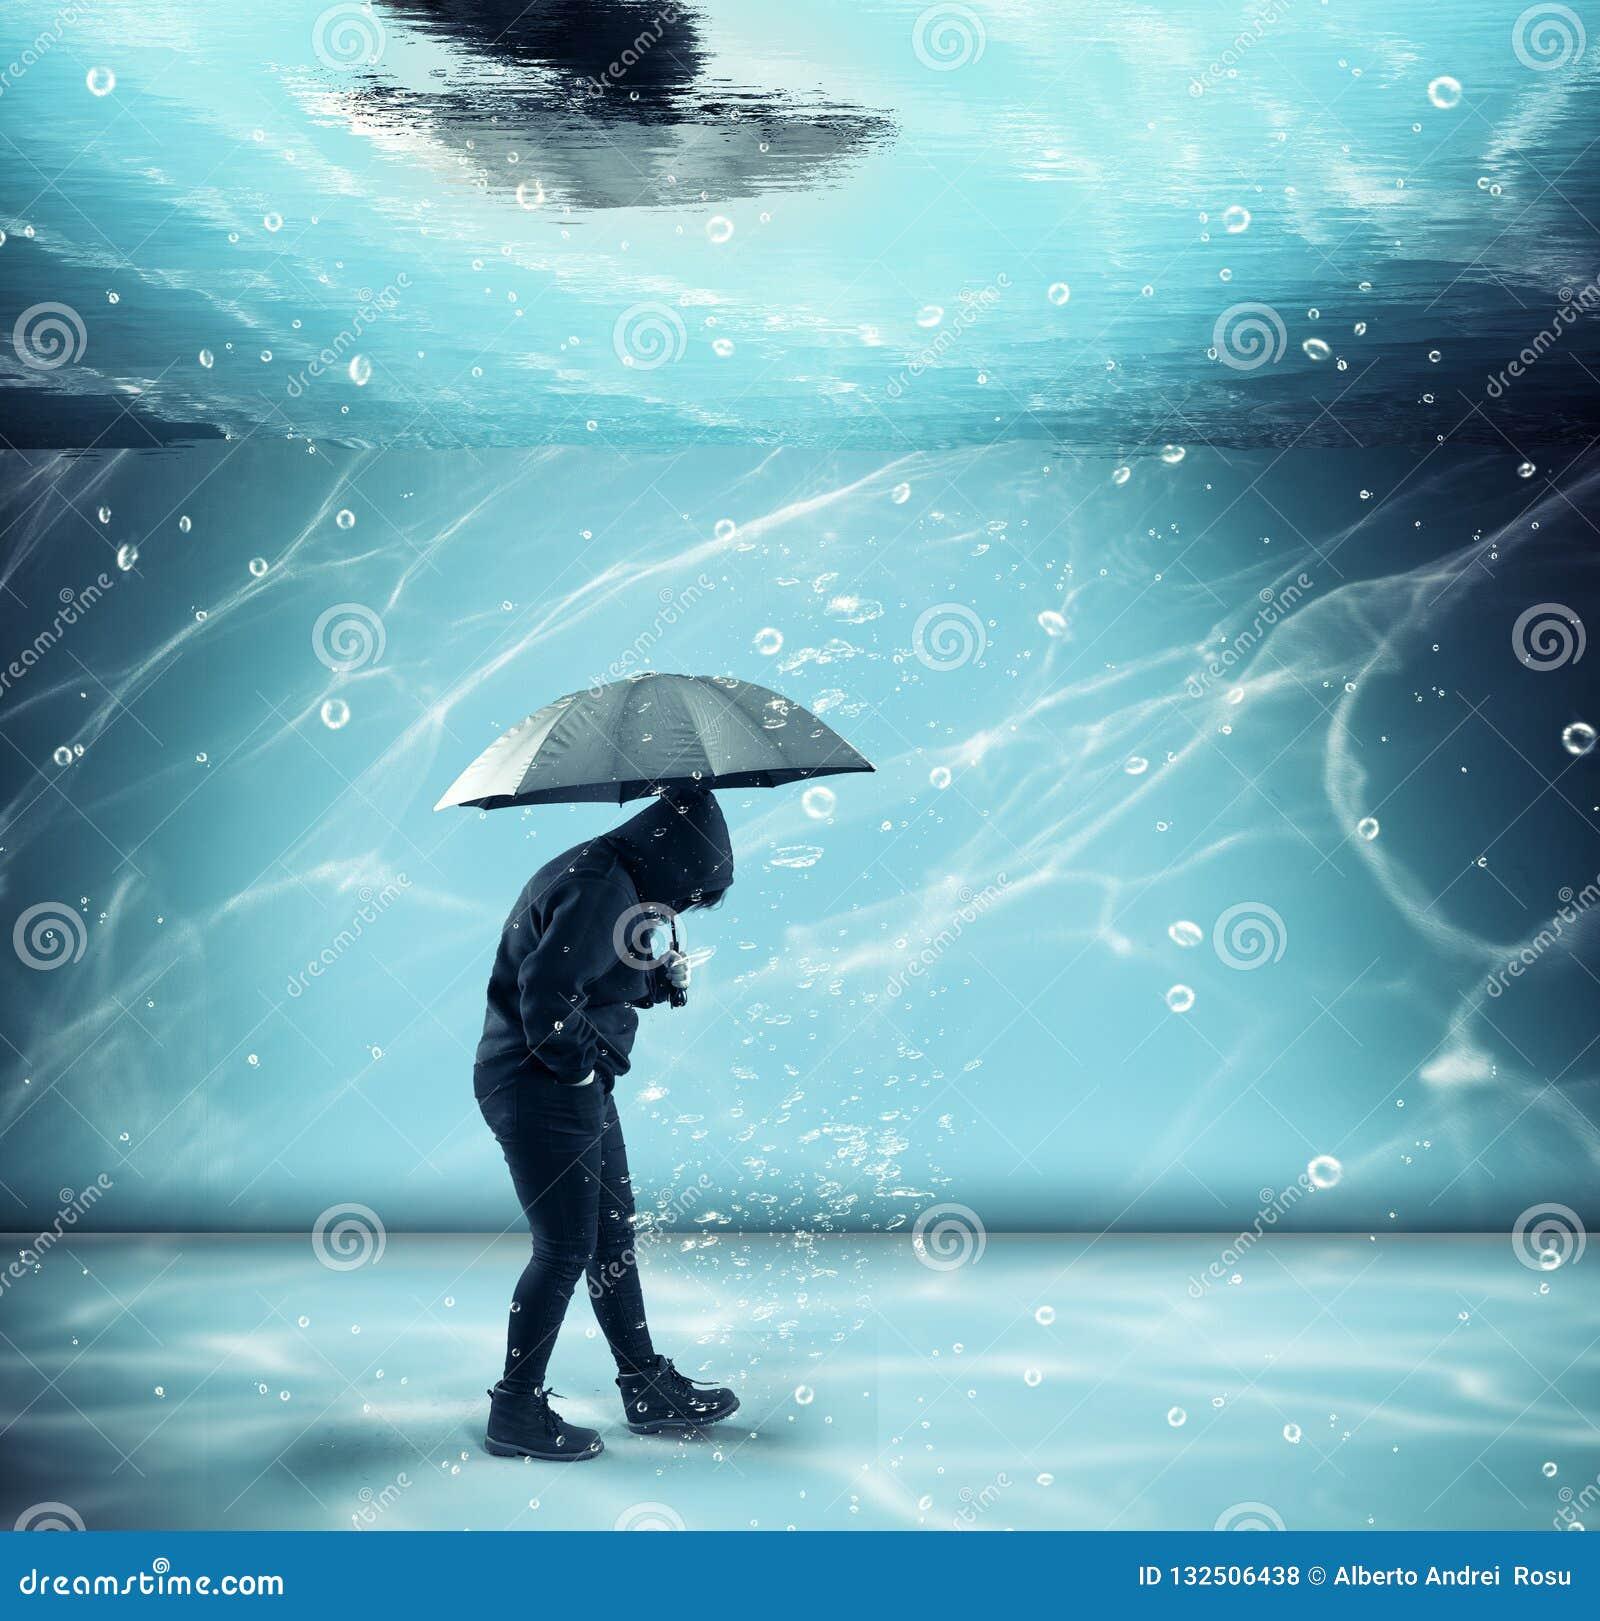 Walking underwater. conceptual image